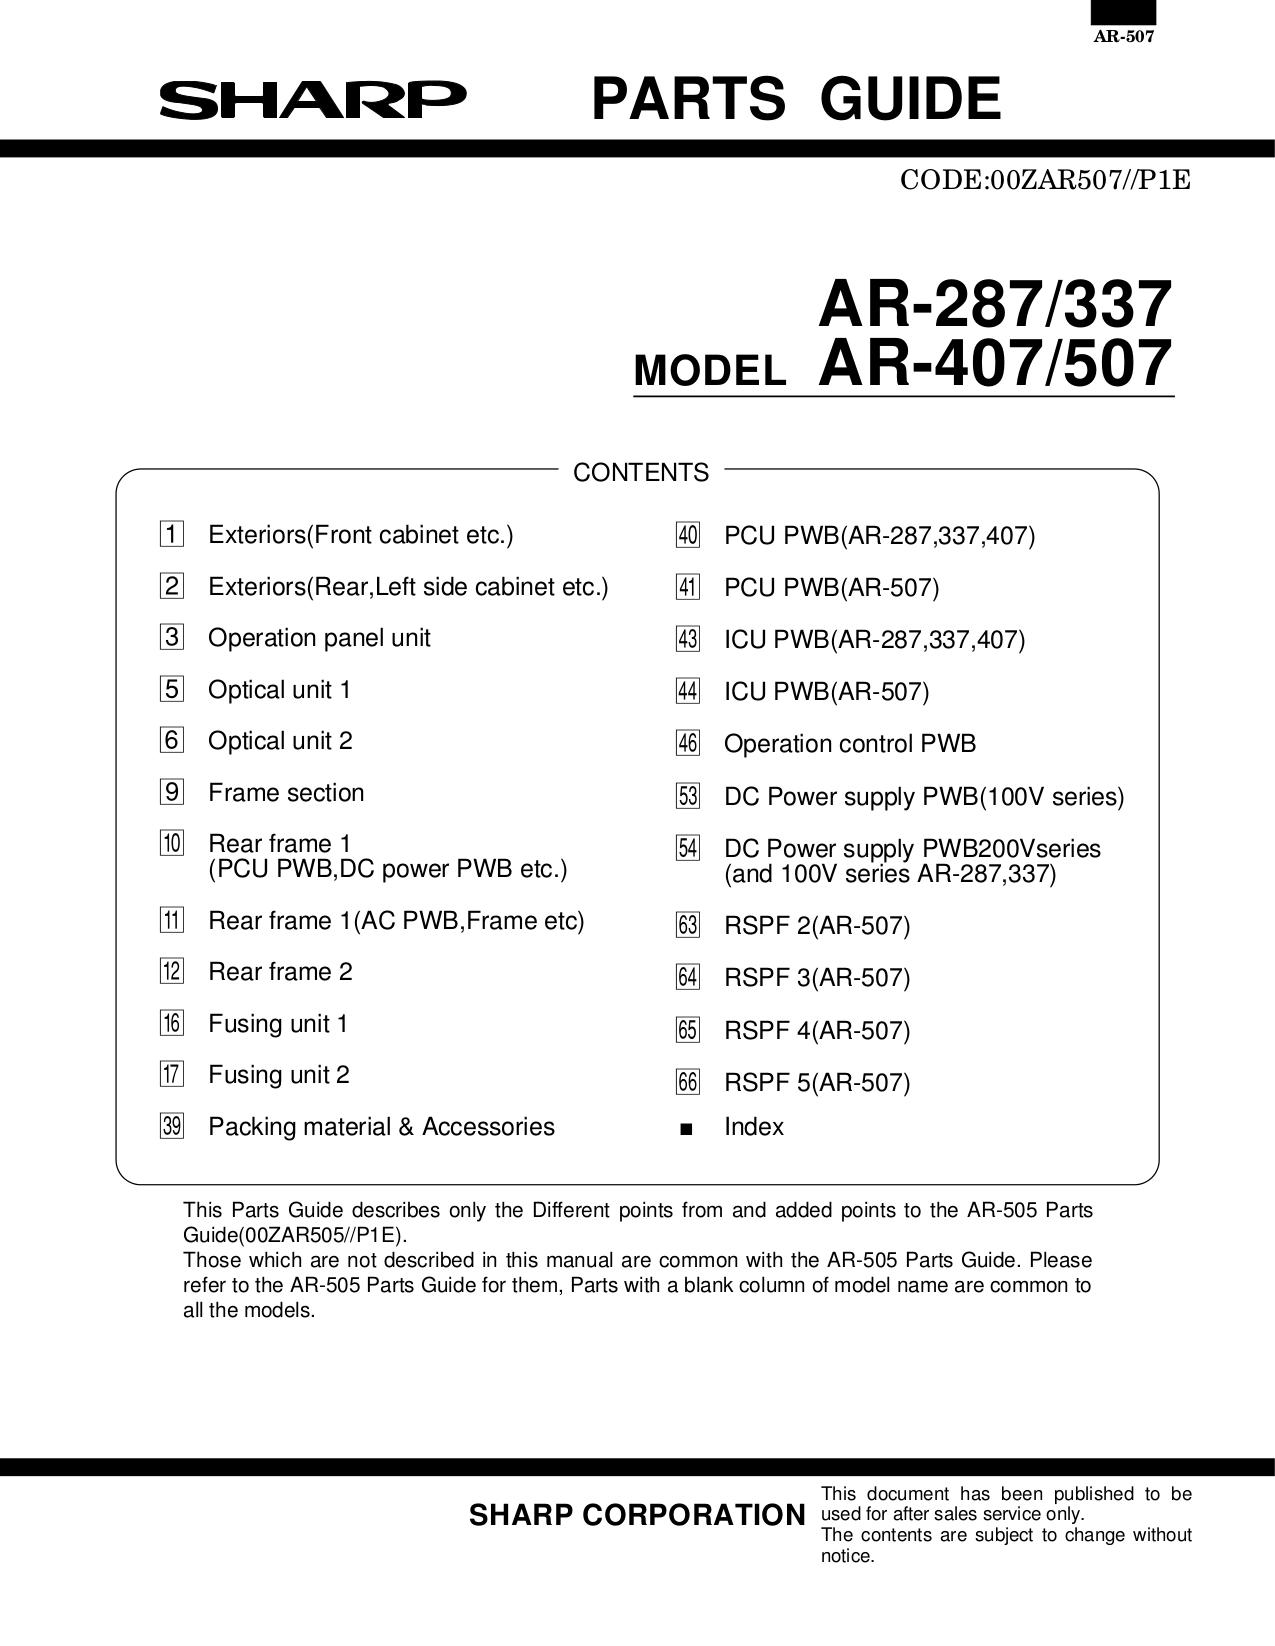 Sharp ar-280 service manual pdf download.